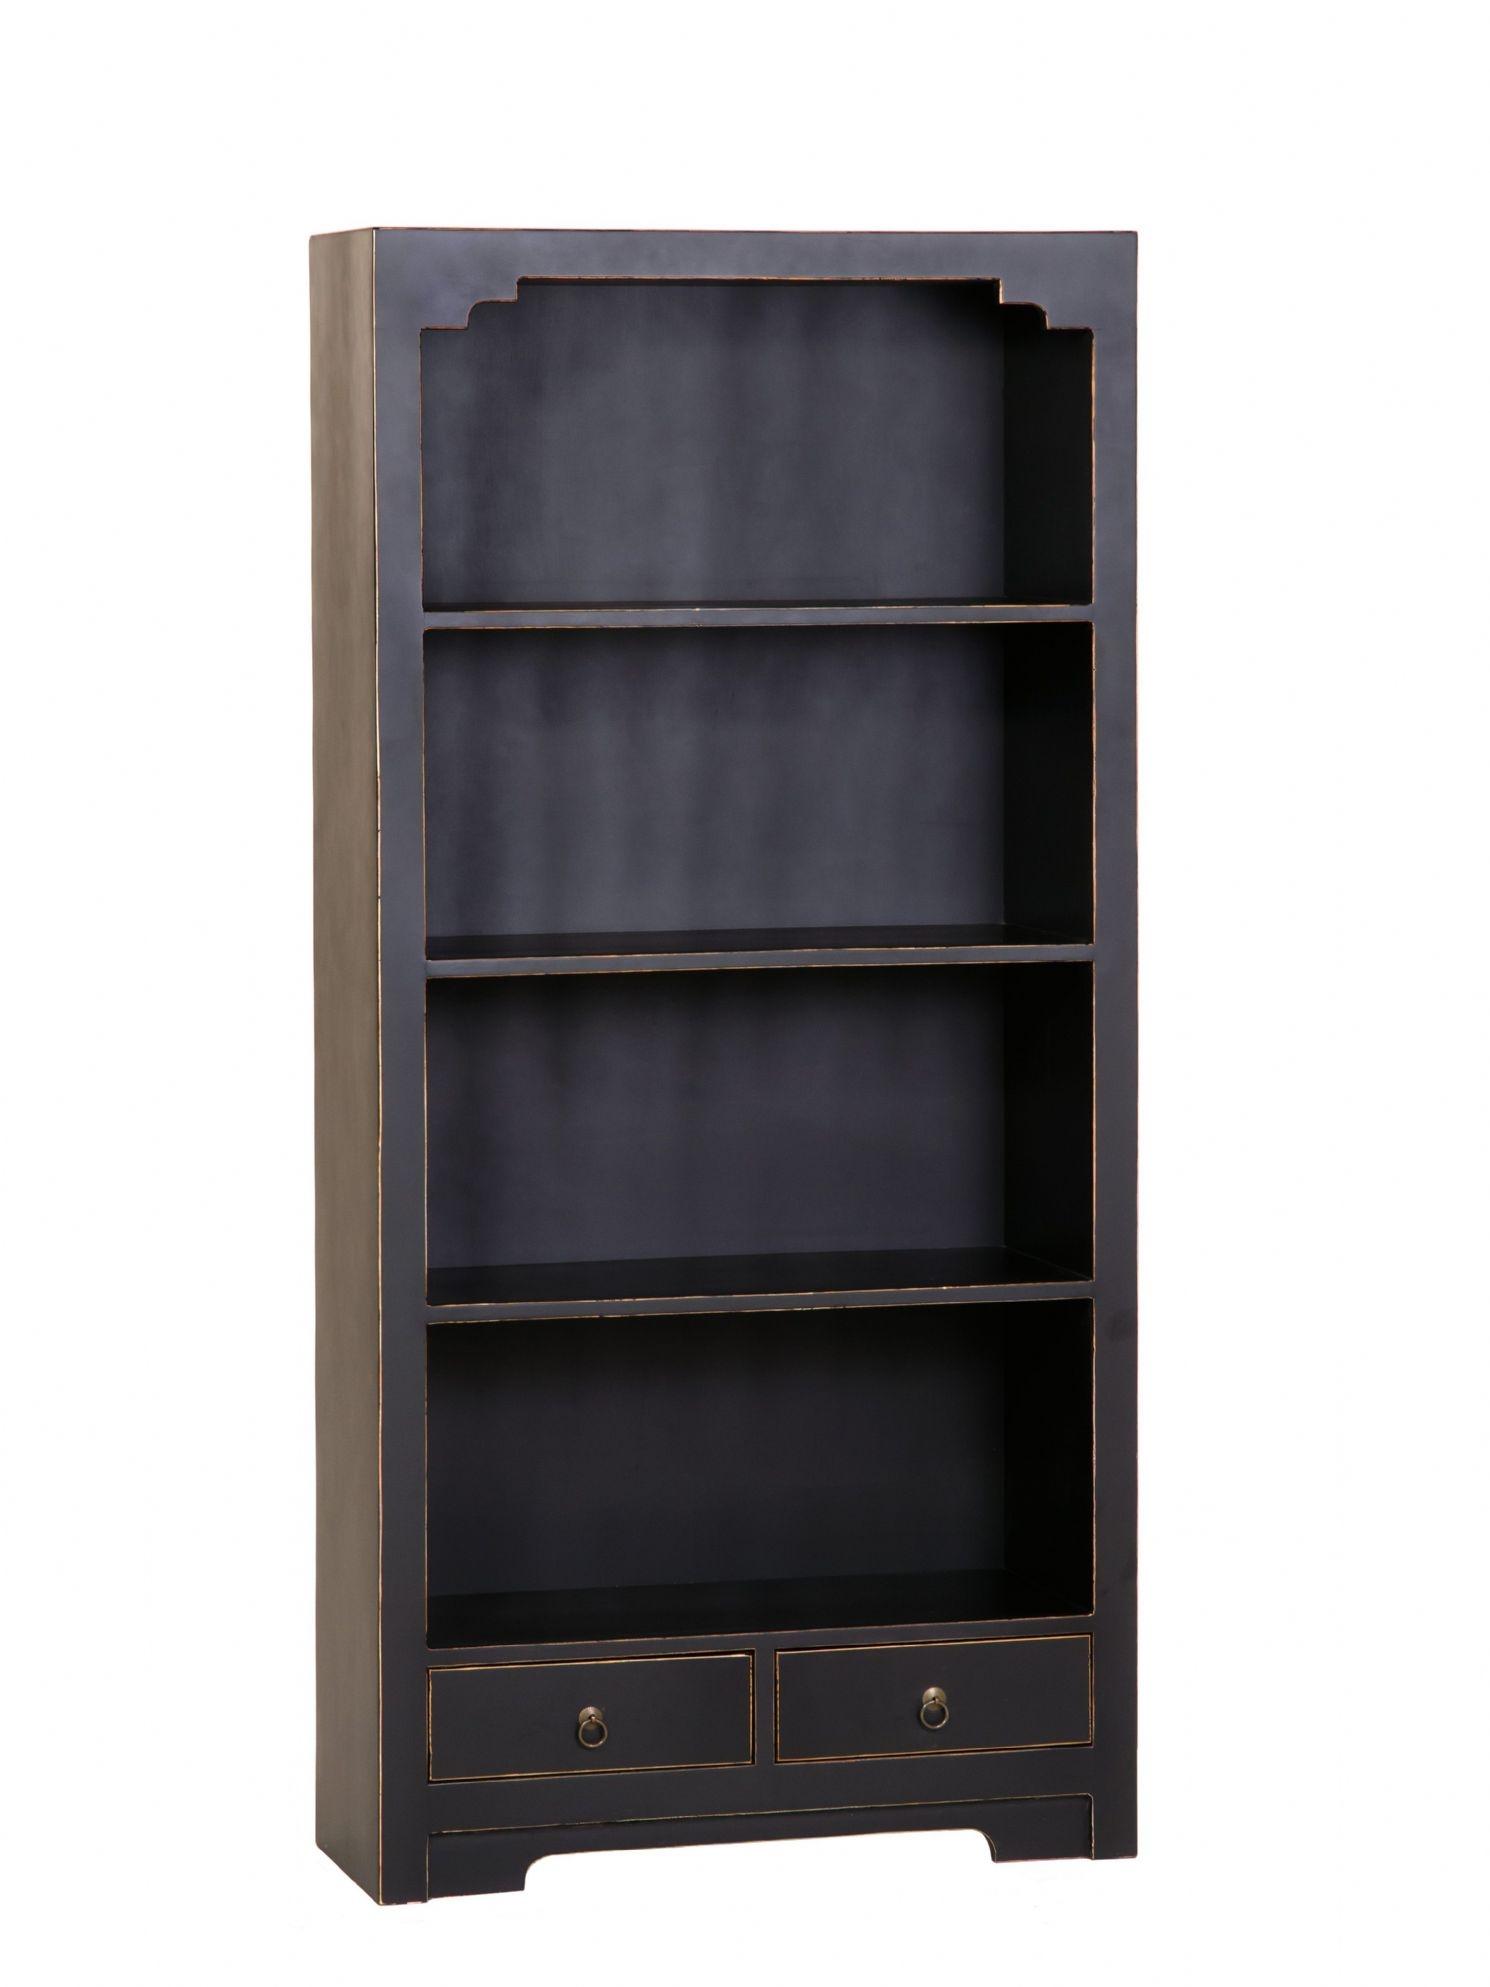 Large Black Bookcase Black Solid Wood Bookcases Black Painted Regarding Painted Wood Bookcase (#7 of 15)